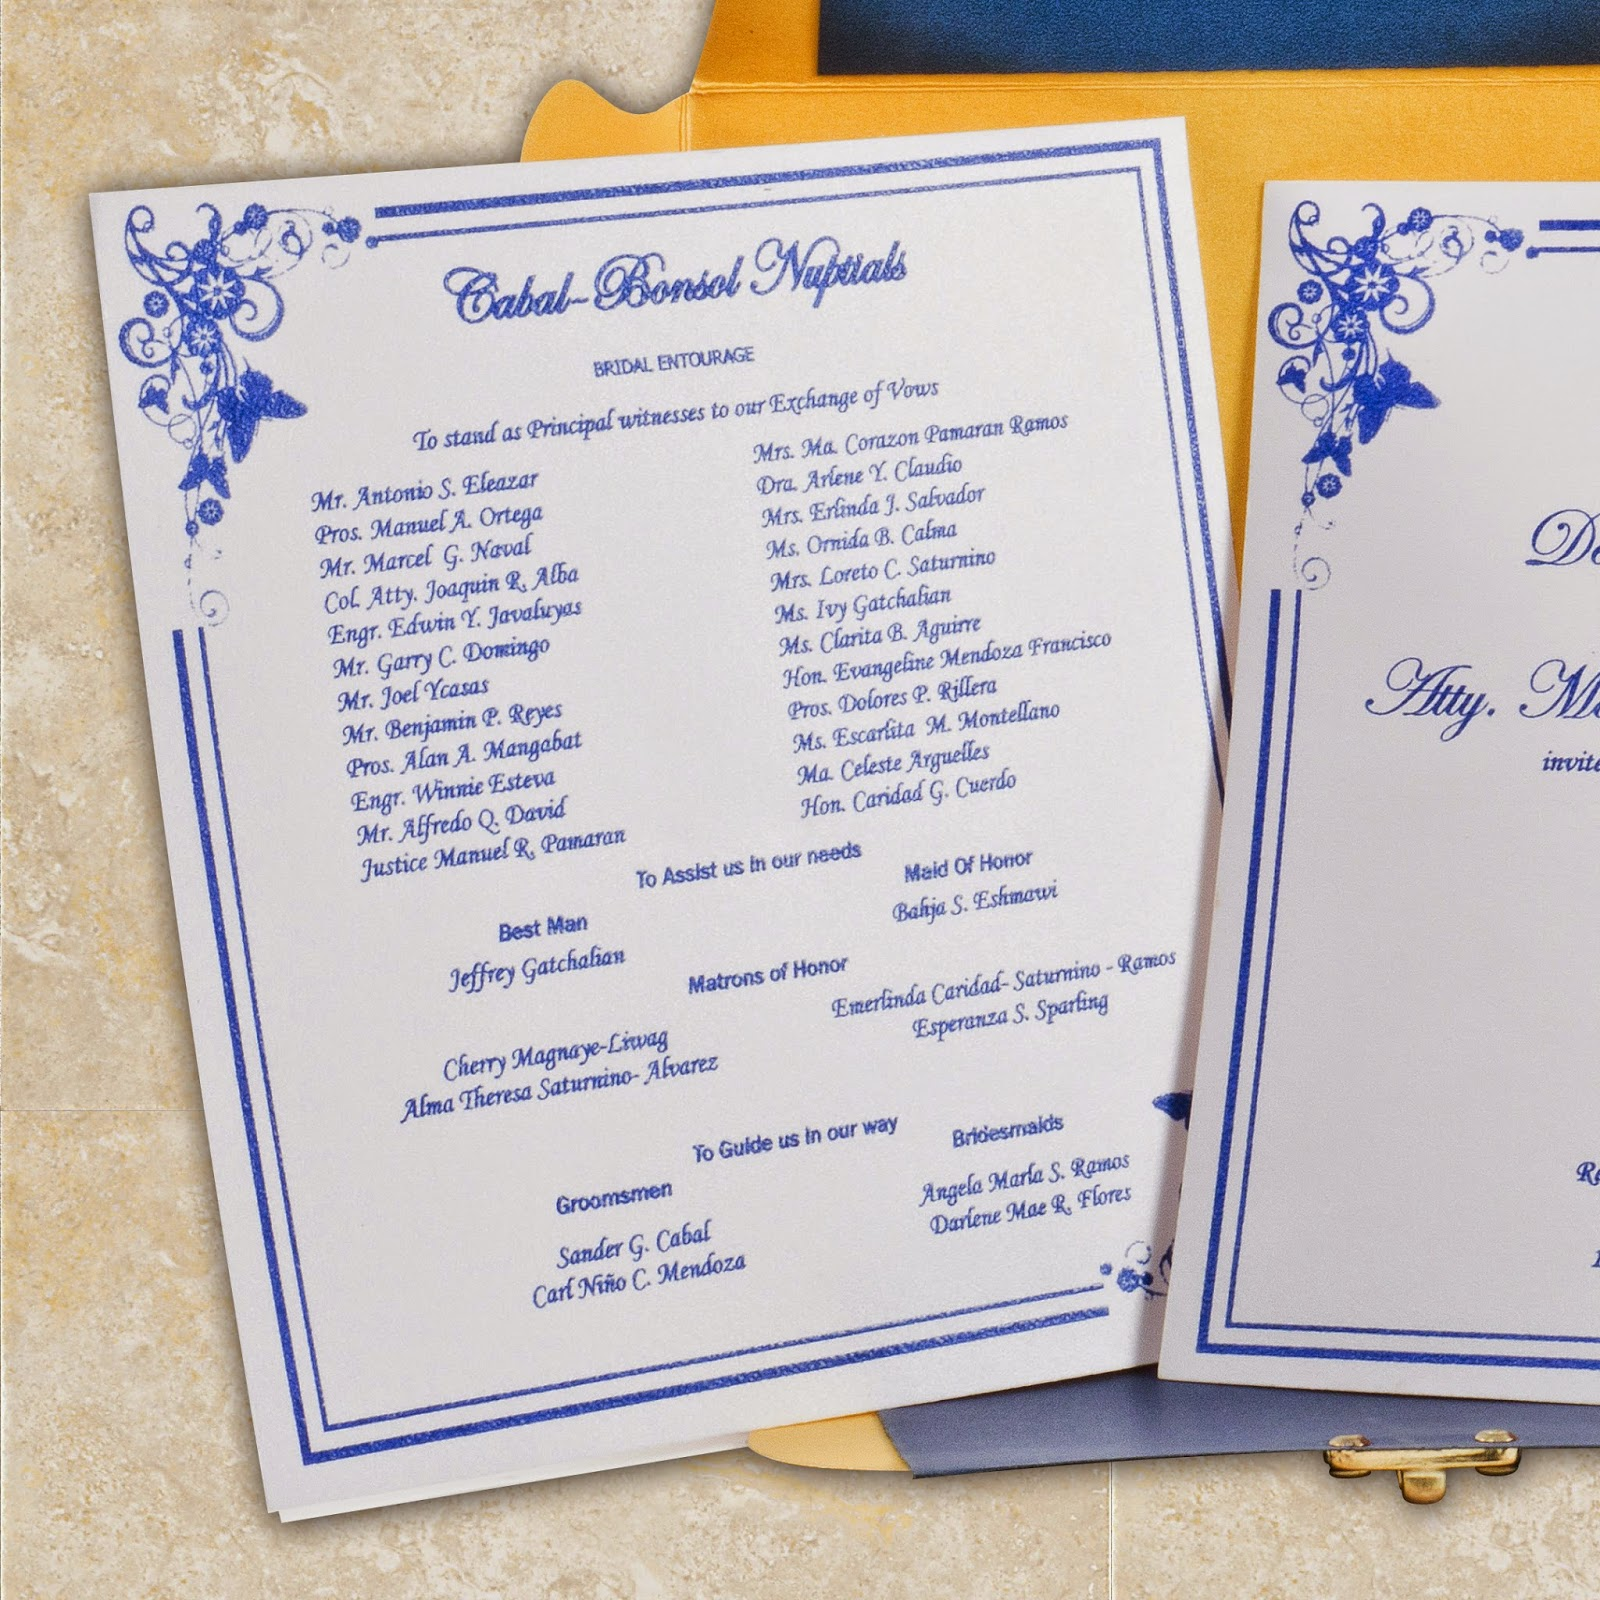 Wedding invitations maker in cebu 28 images invitation maker in wedding invitations maker in cebu cebu wedding invitations stopboris Gallery